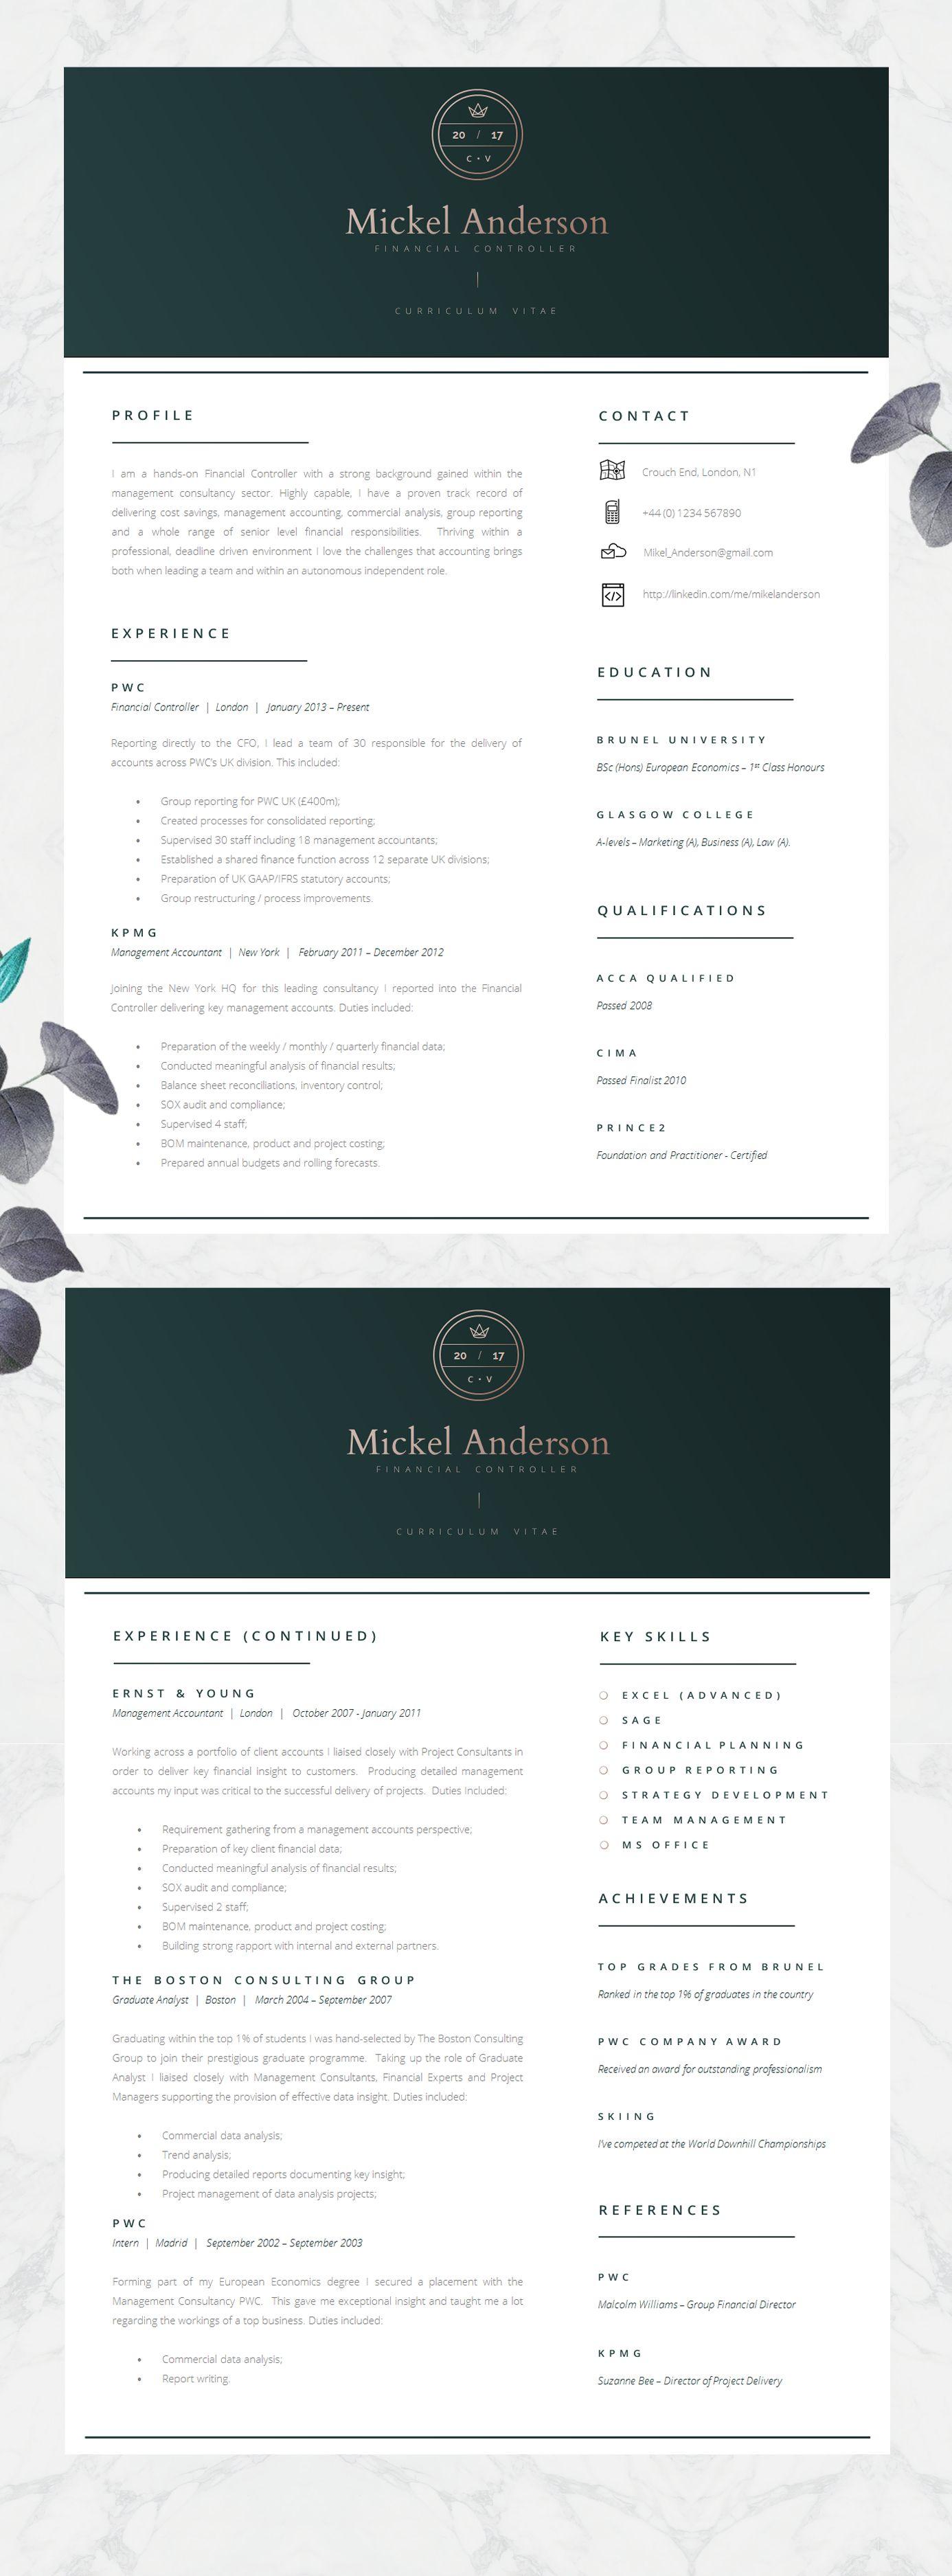 Professional Cv Template In Dark Green Stylish Resume For Etsy Resume Design Template Cv Template Modern Resume Template